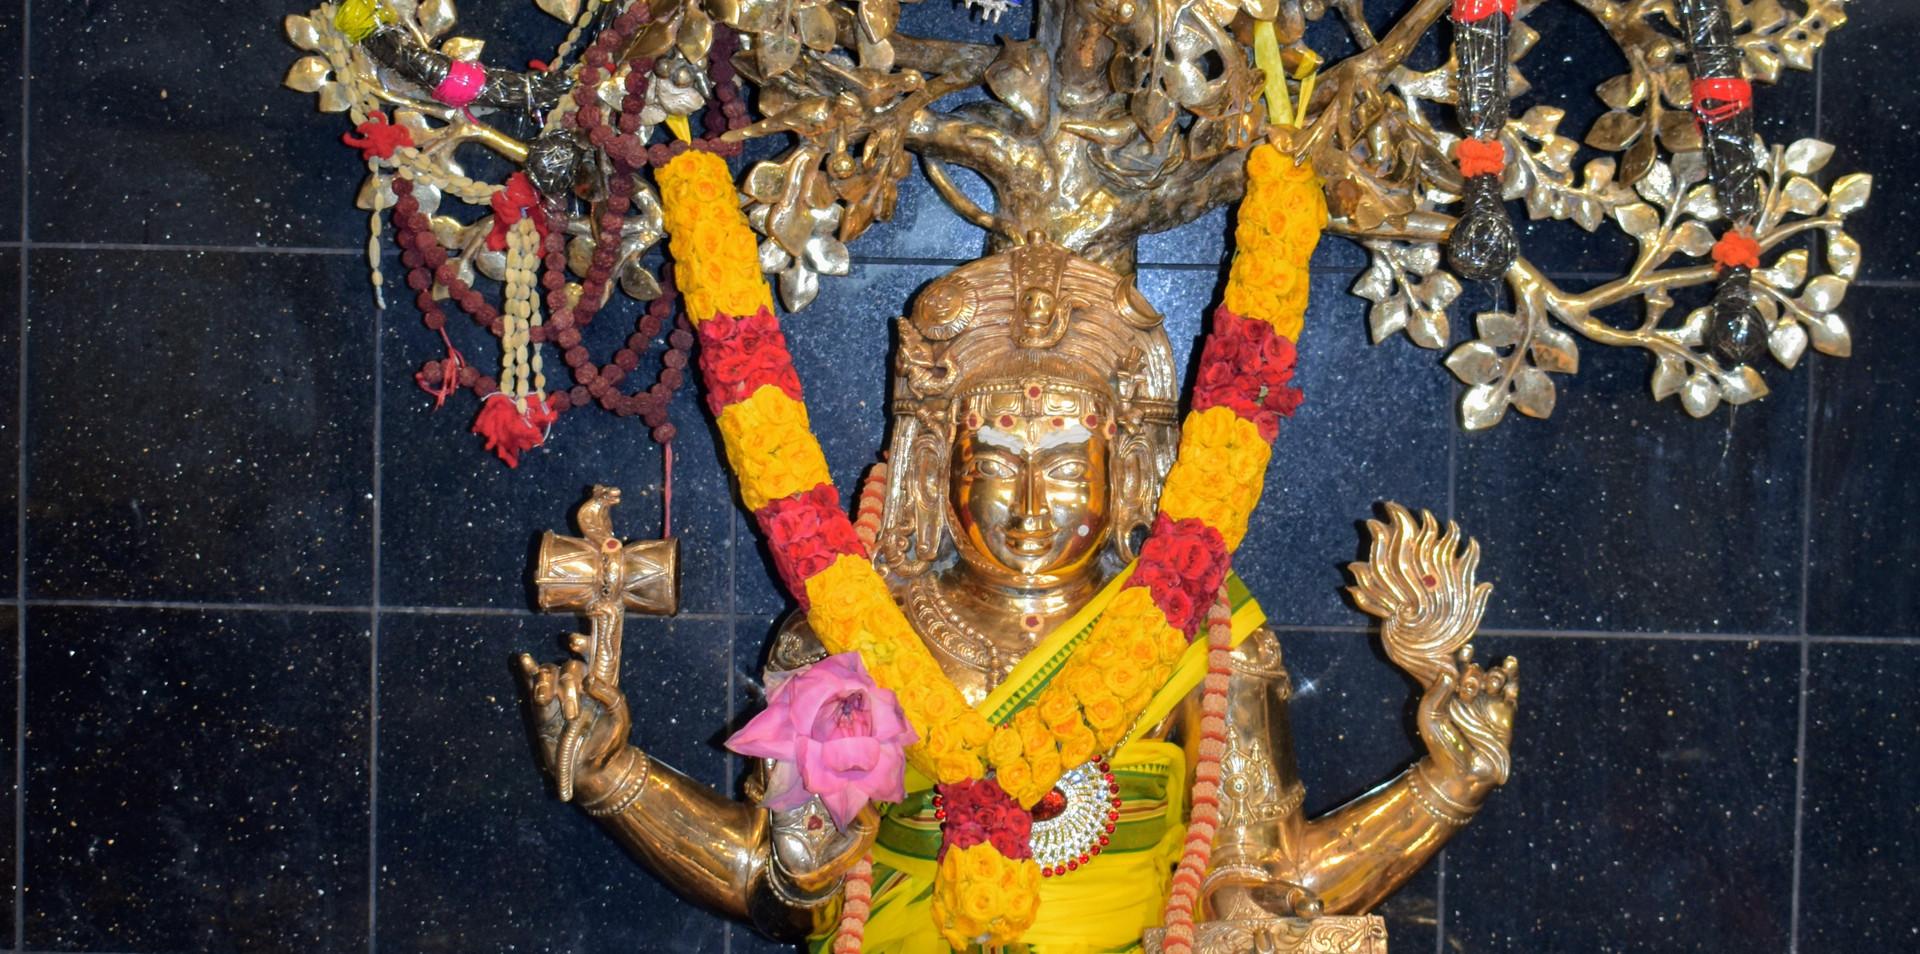 Lord Dakshinamoorthy